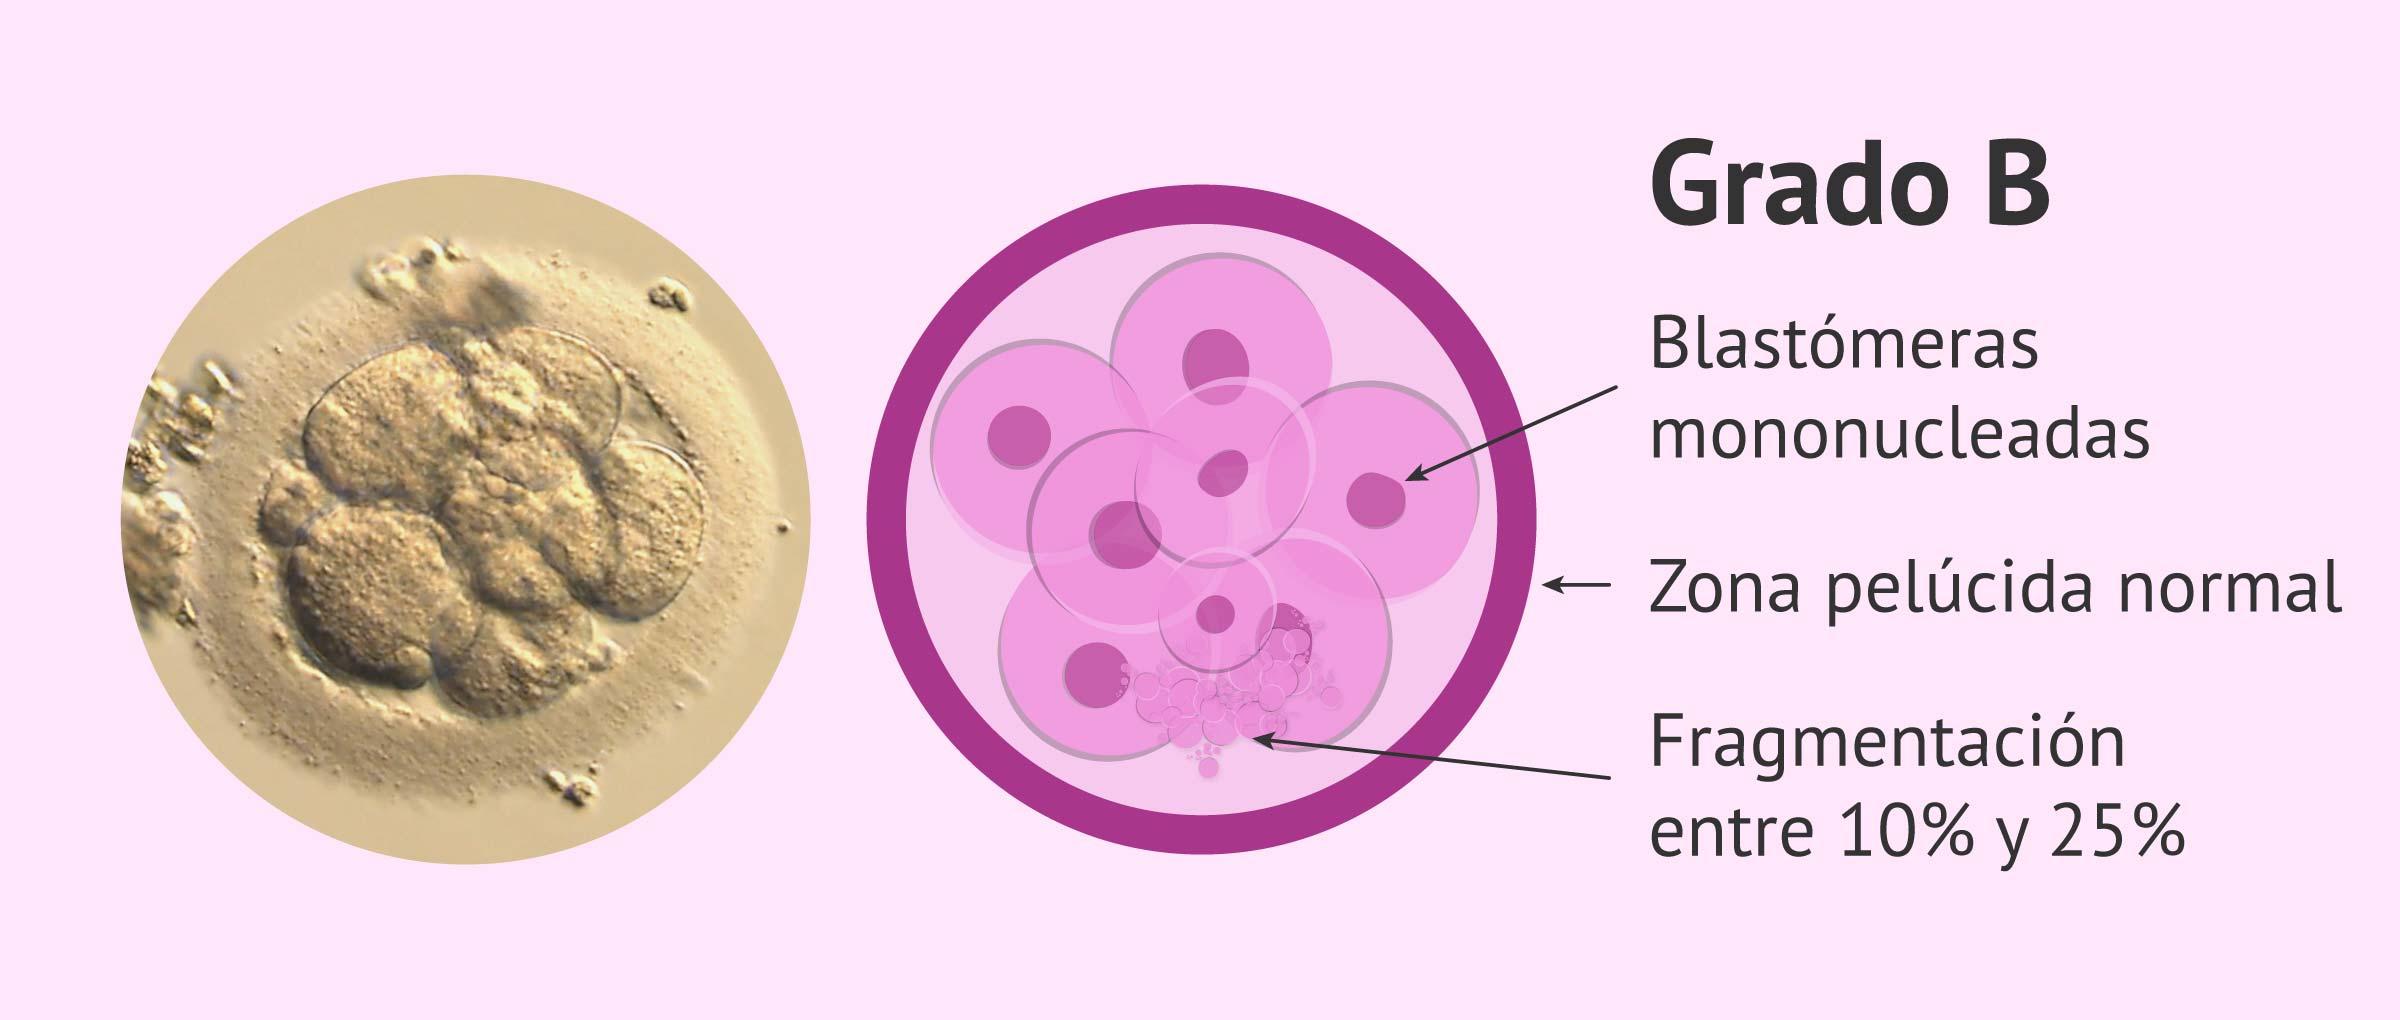 Calidad embrionaria: grado B